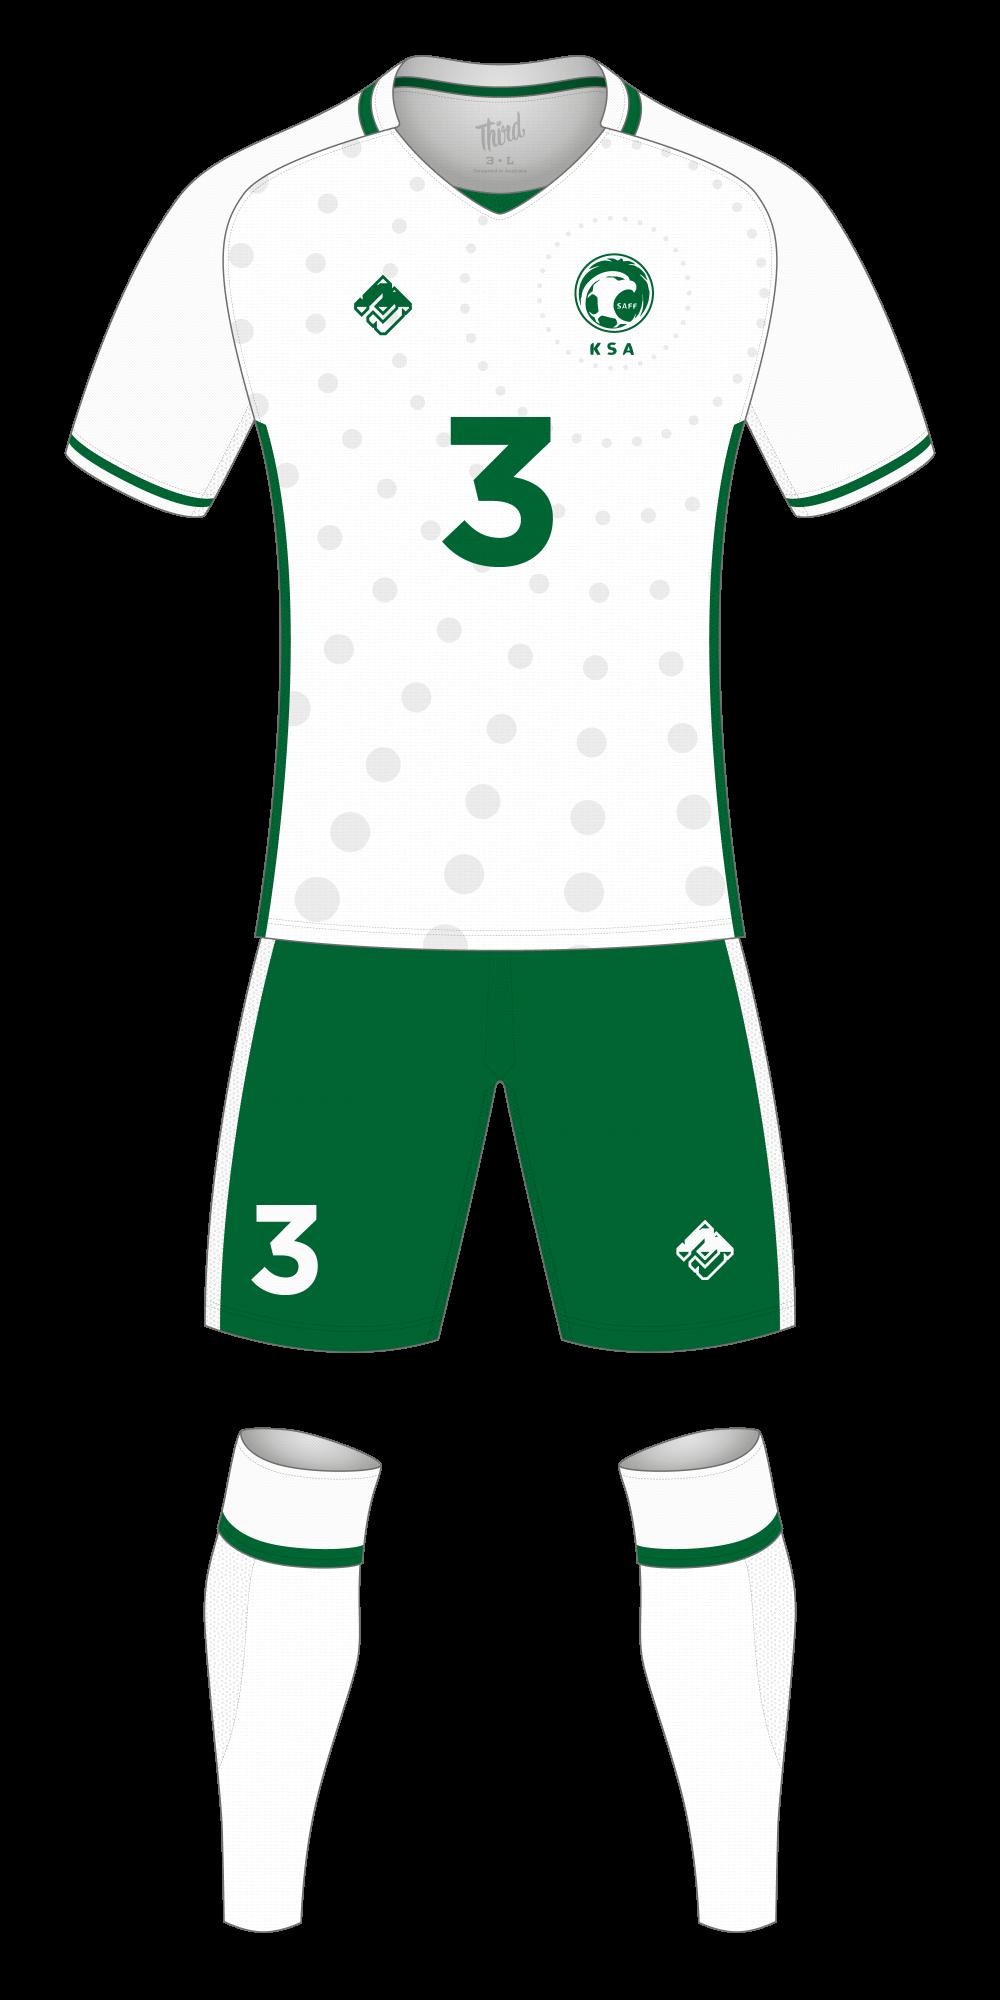 Saudi Arabia World Cup 2018 concept